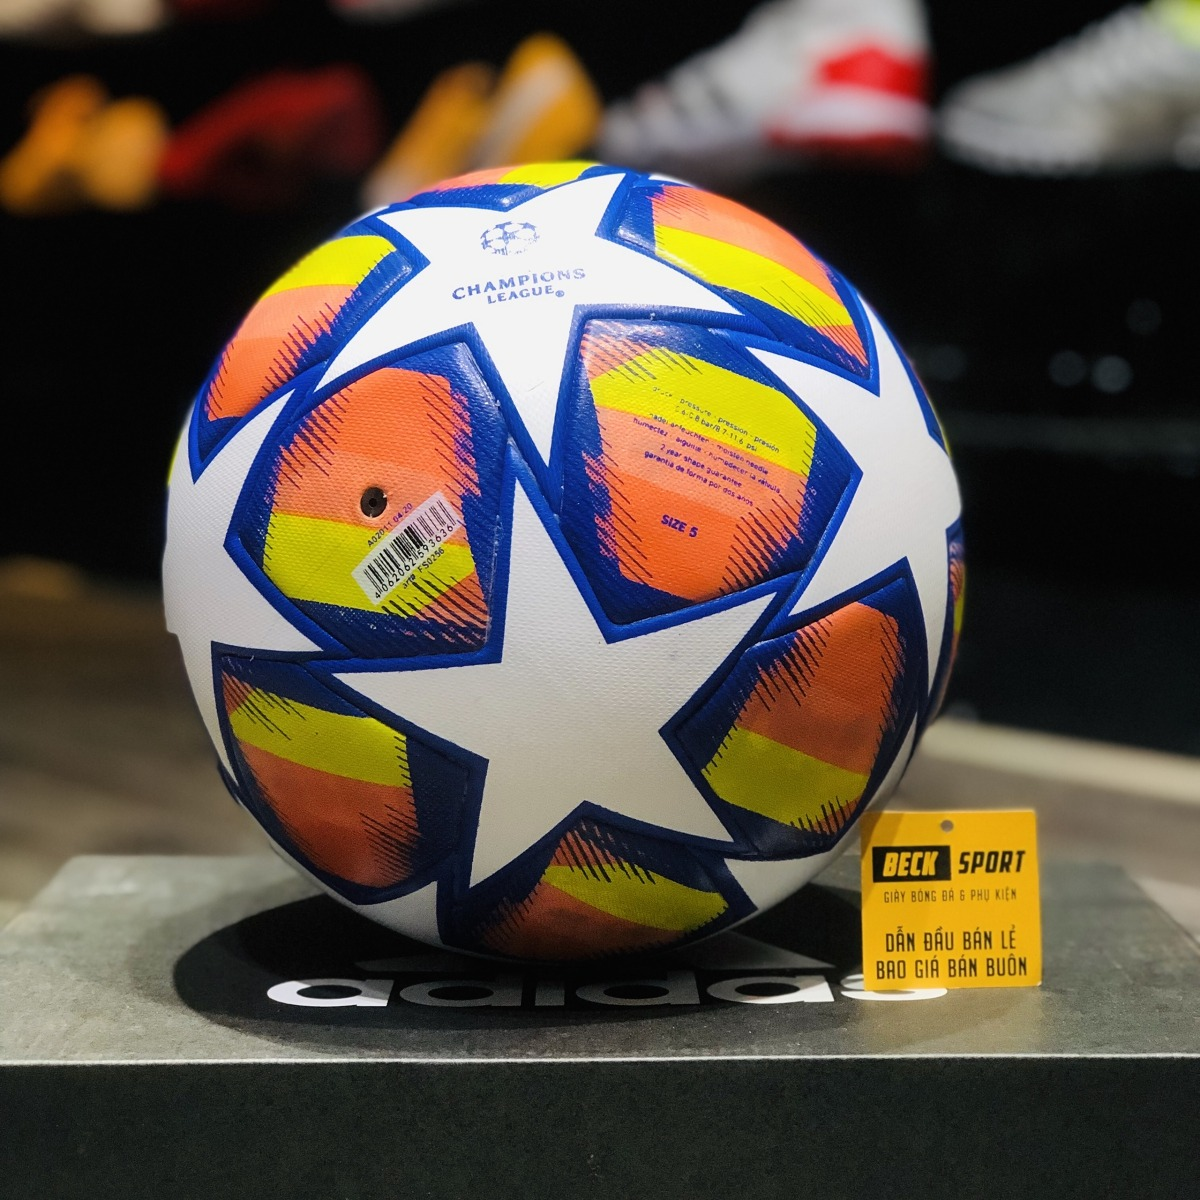 Quả Bóng Đá Adidas Champions League C1 Cam Trắng - Size 5